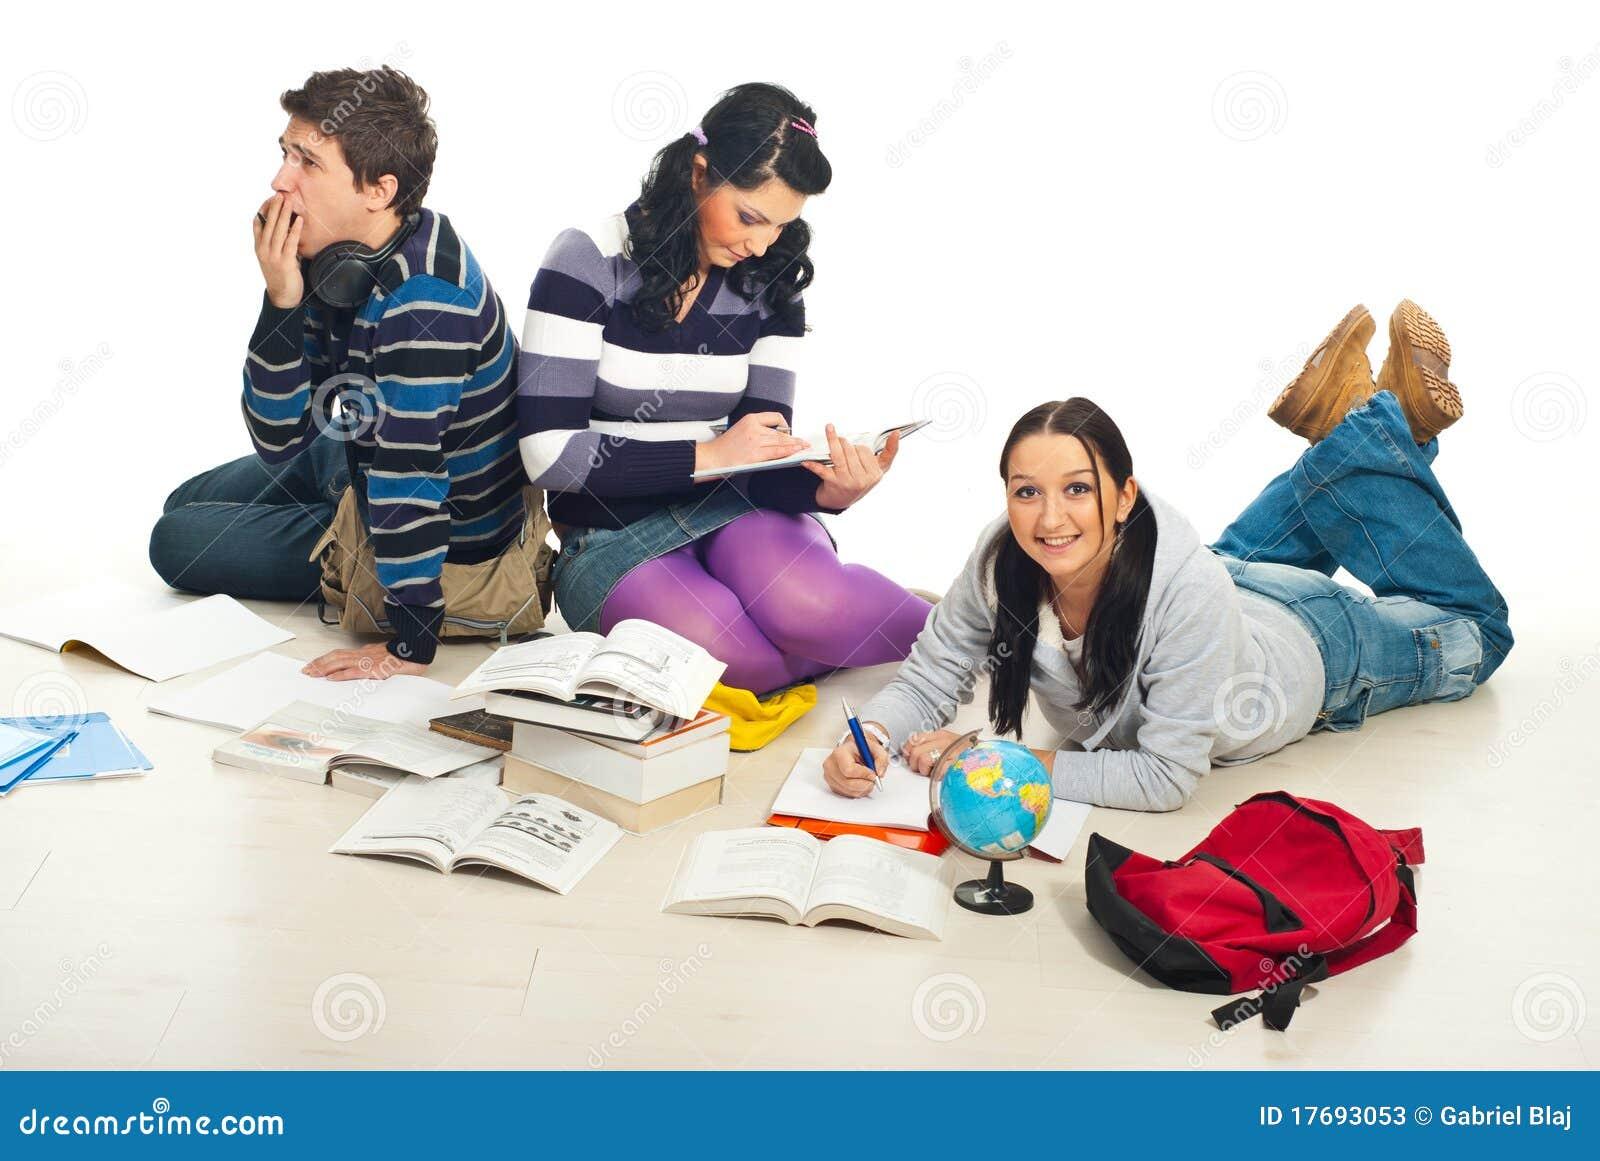 a person doing homework